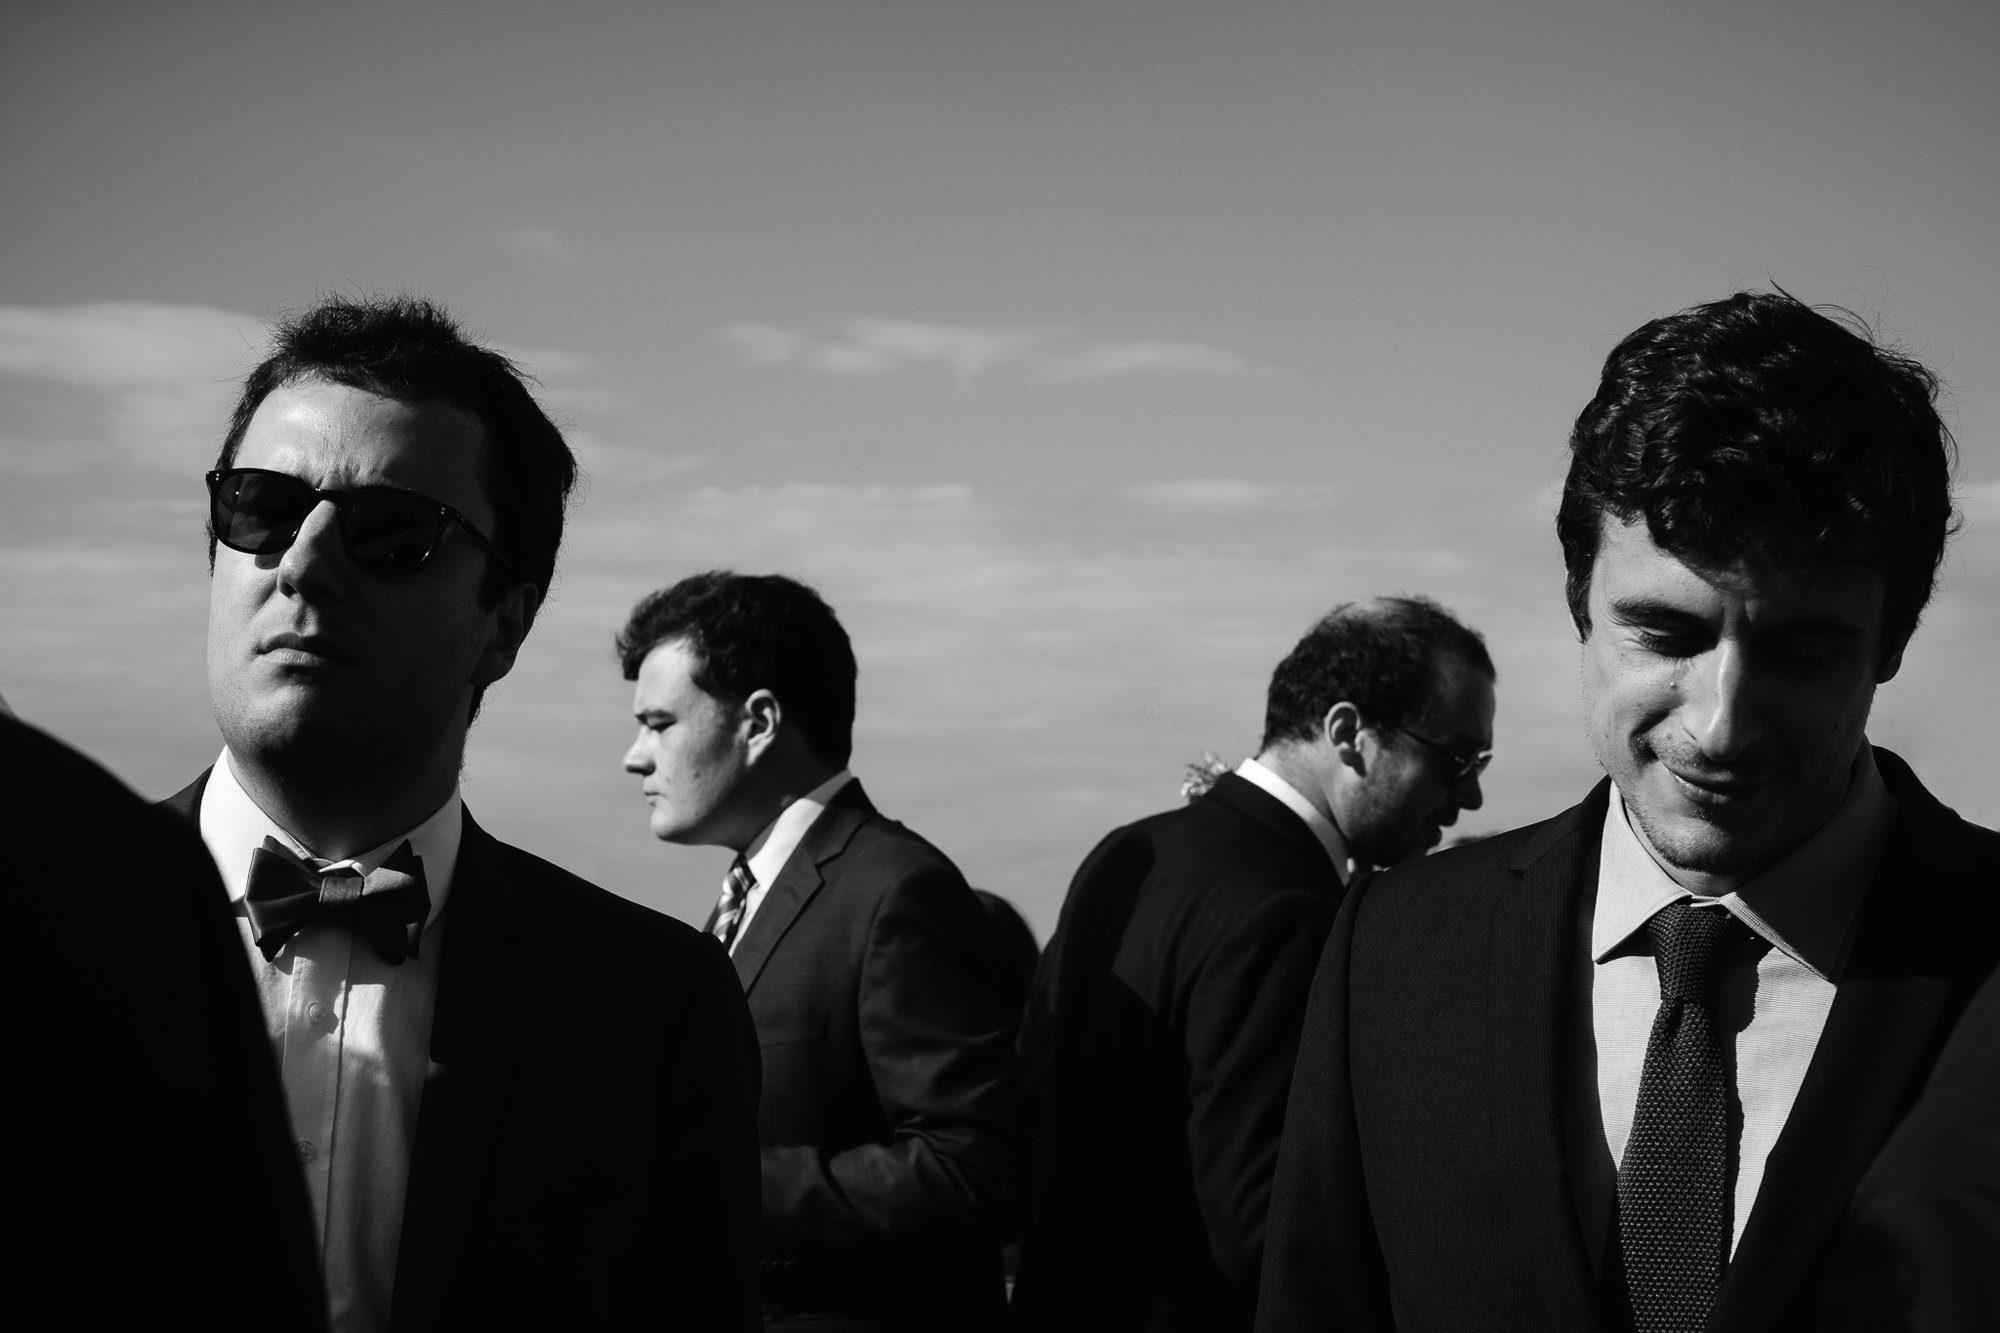 Leica M10 wedding photography